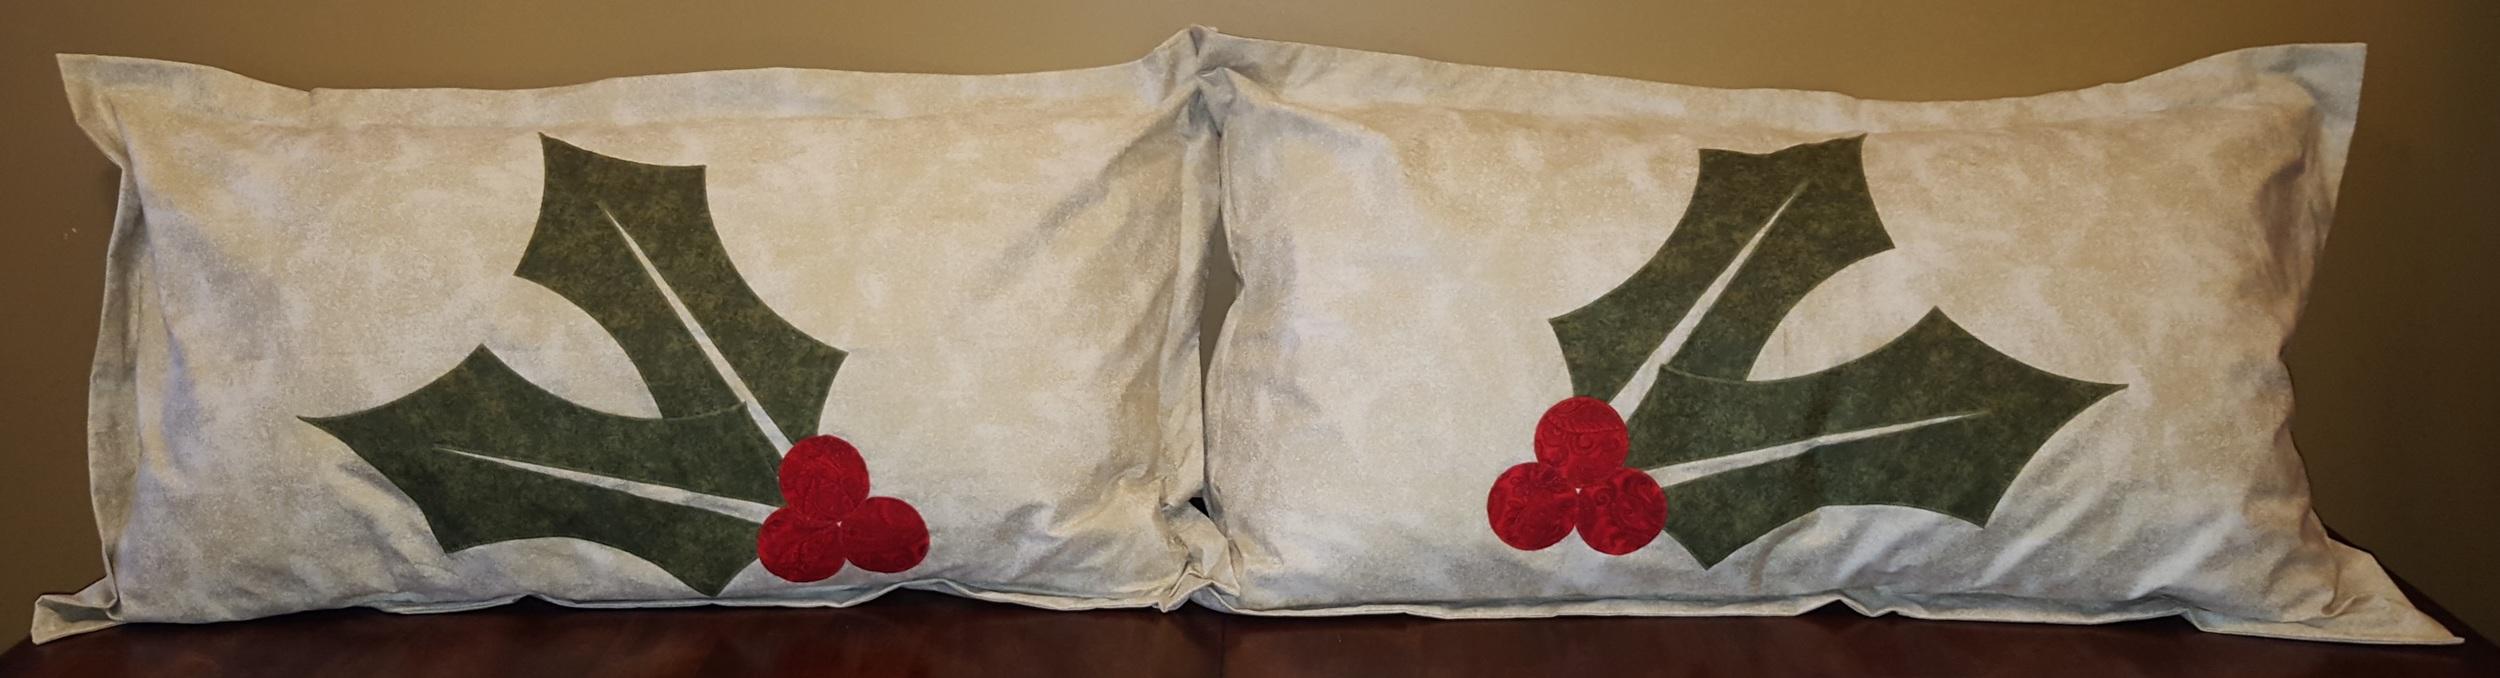 King Size Pillow Shams